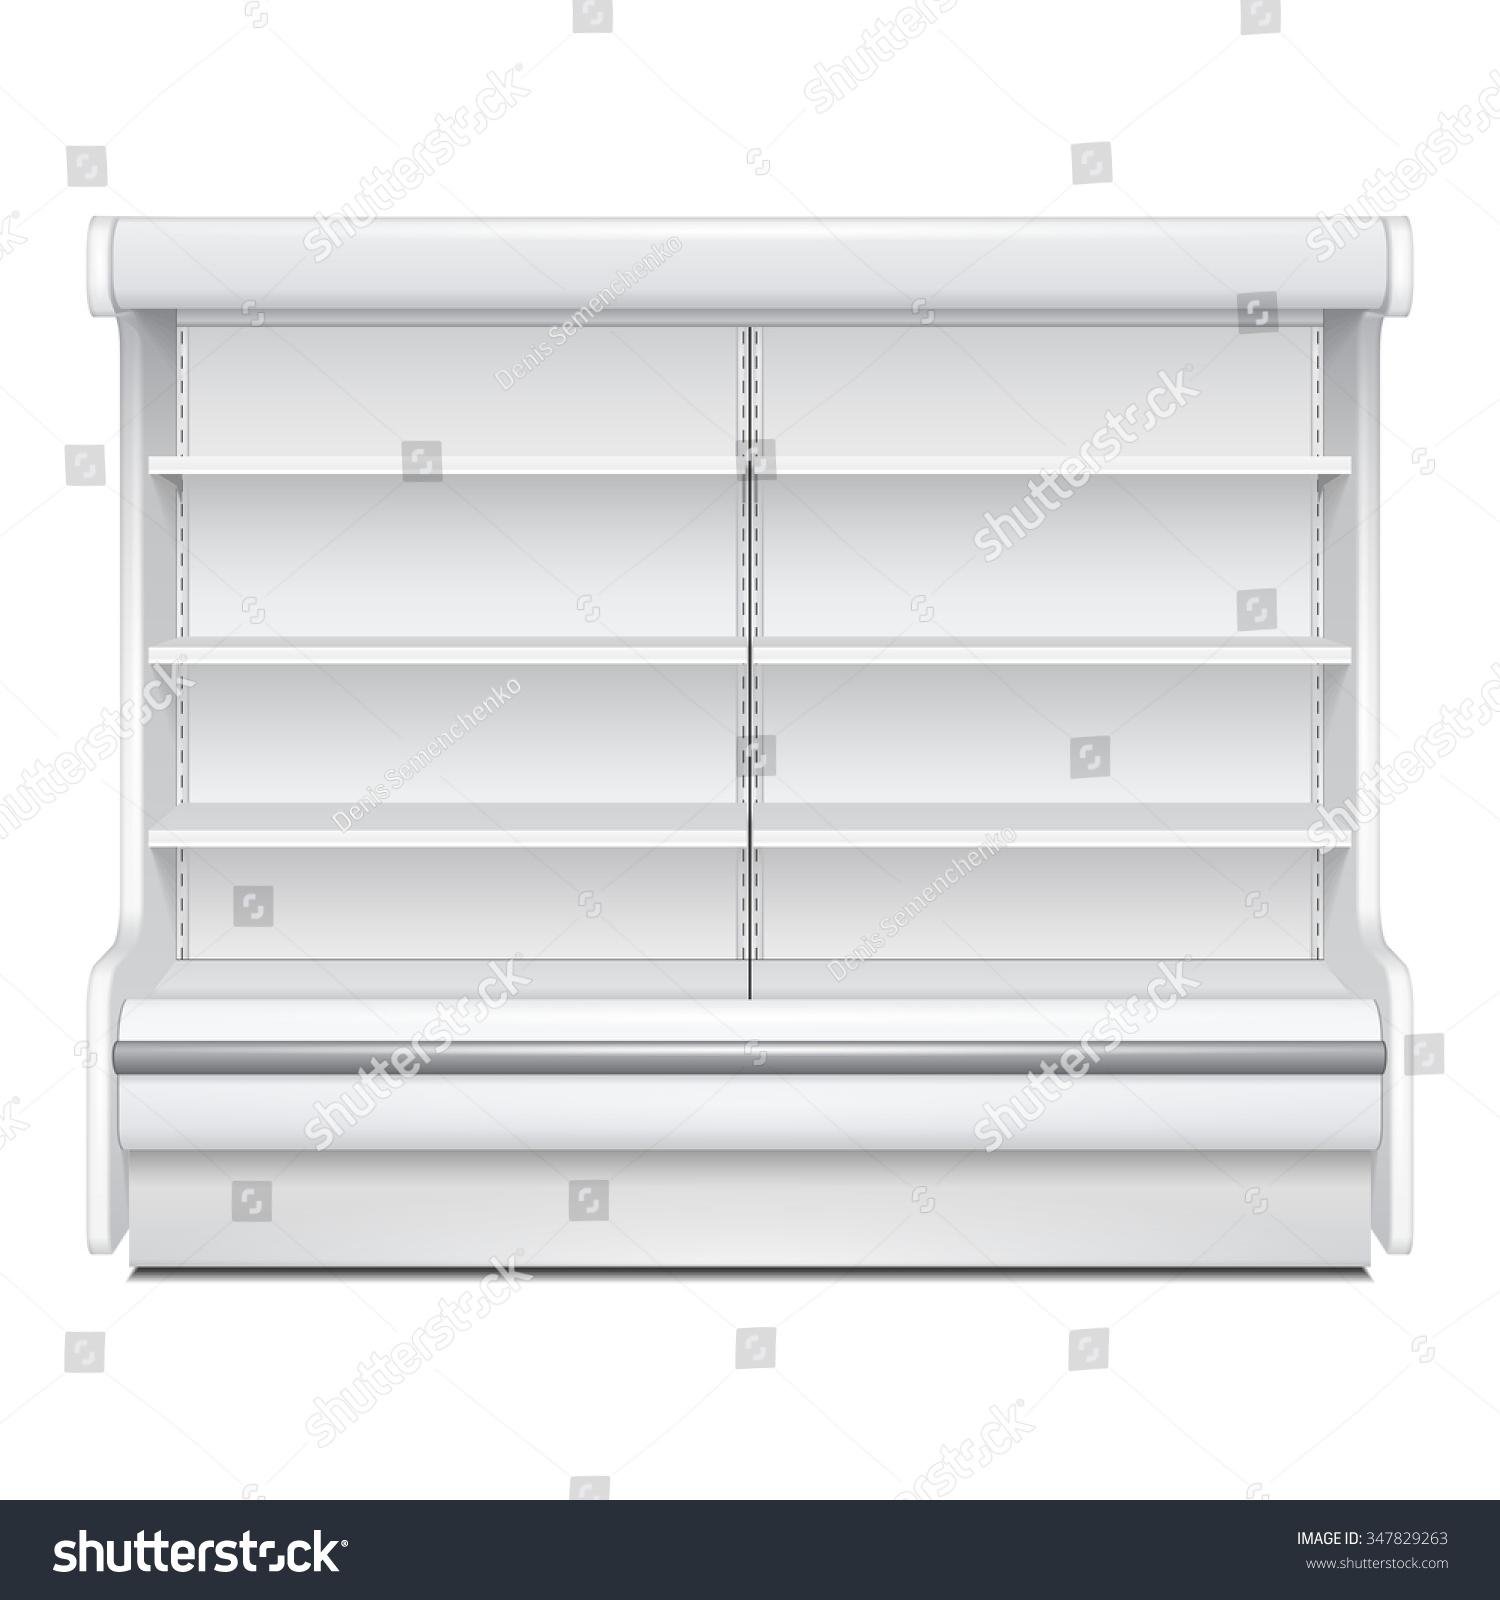 Cooled Regal Rack Refrigerator Wall Cabinet Stock Vector 347829263 Shutterstock